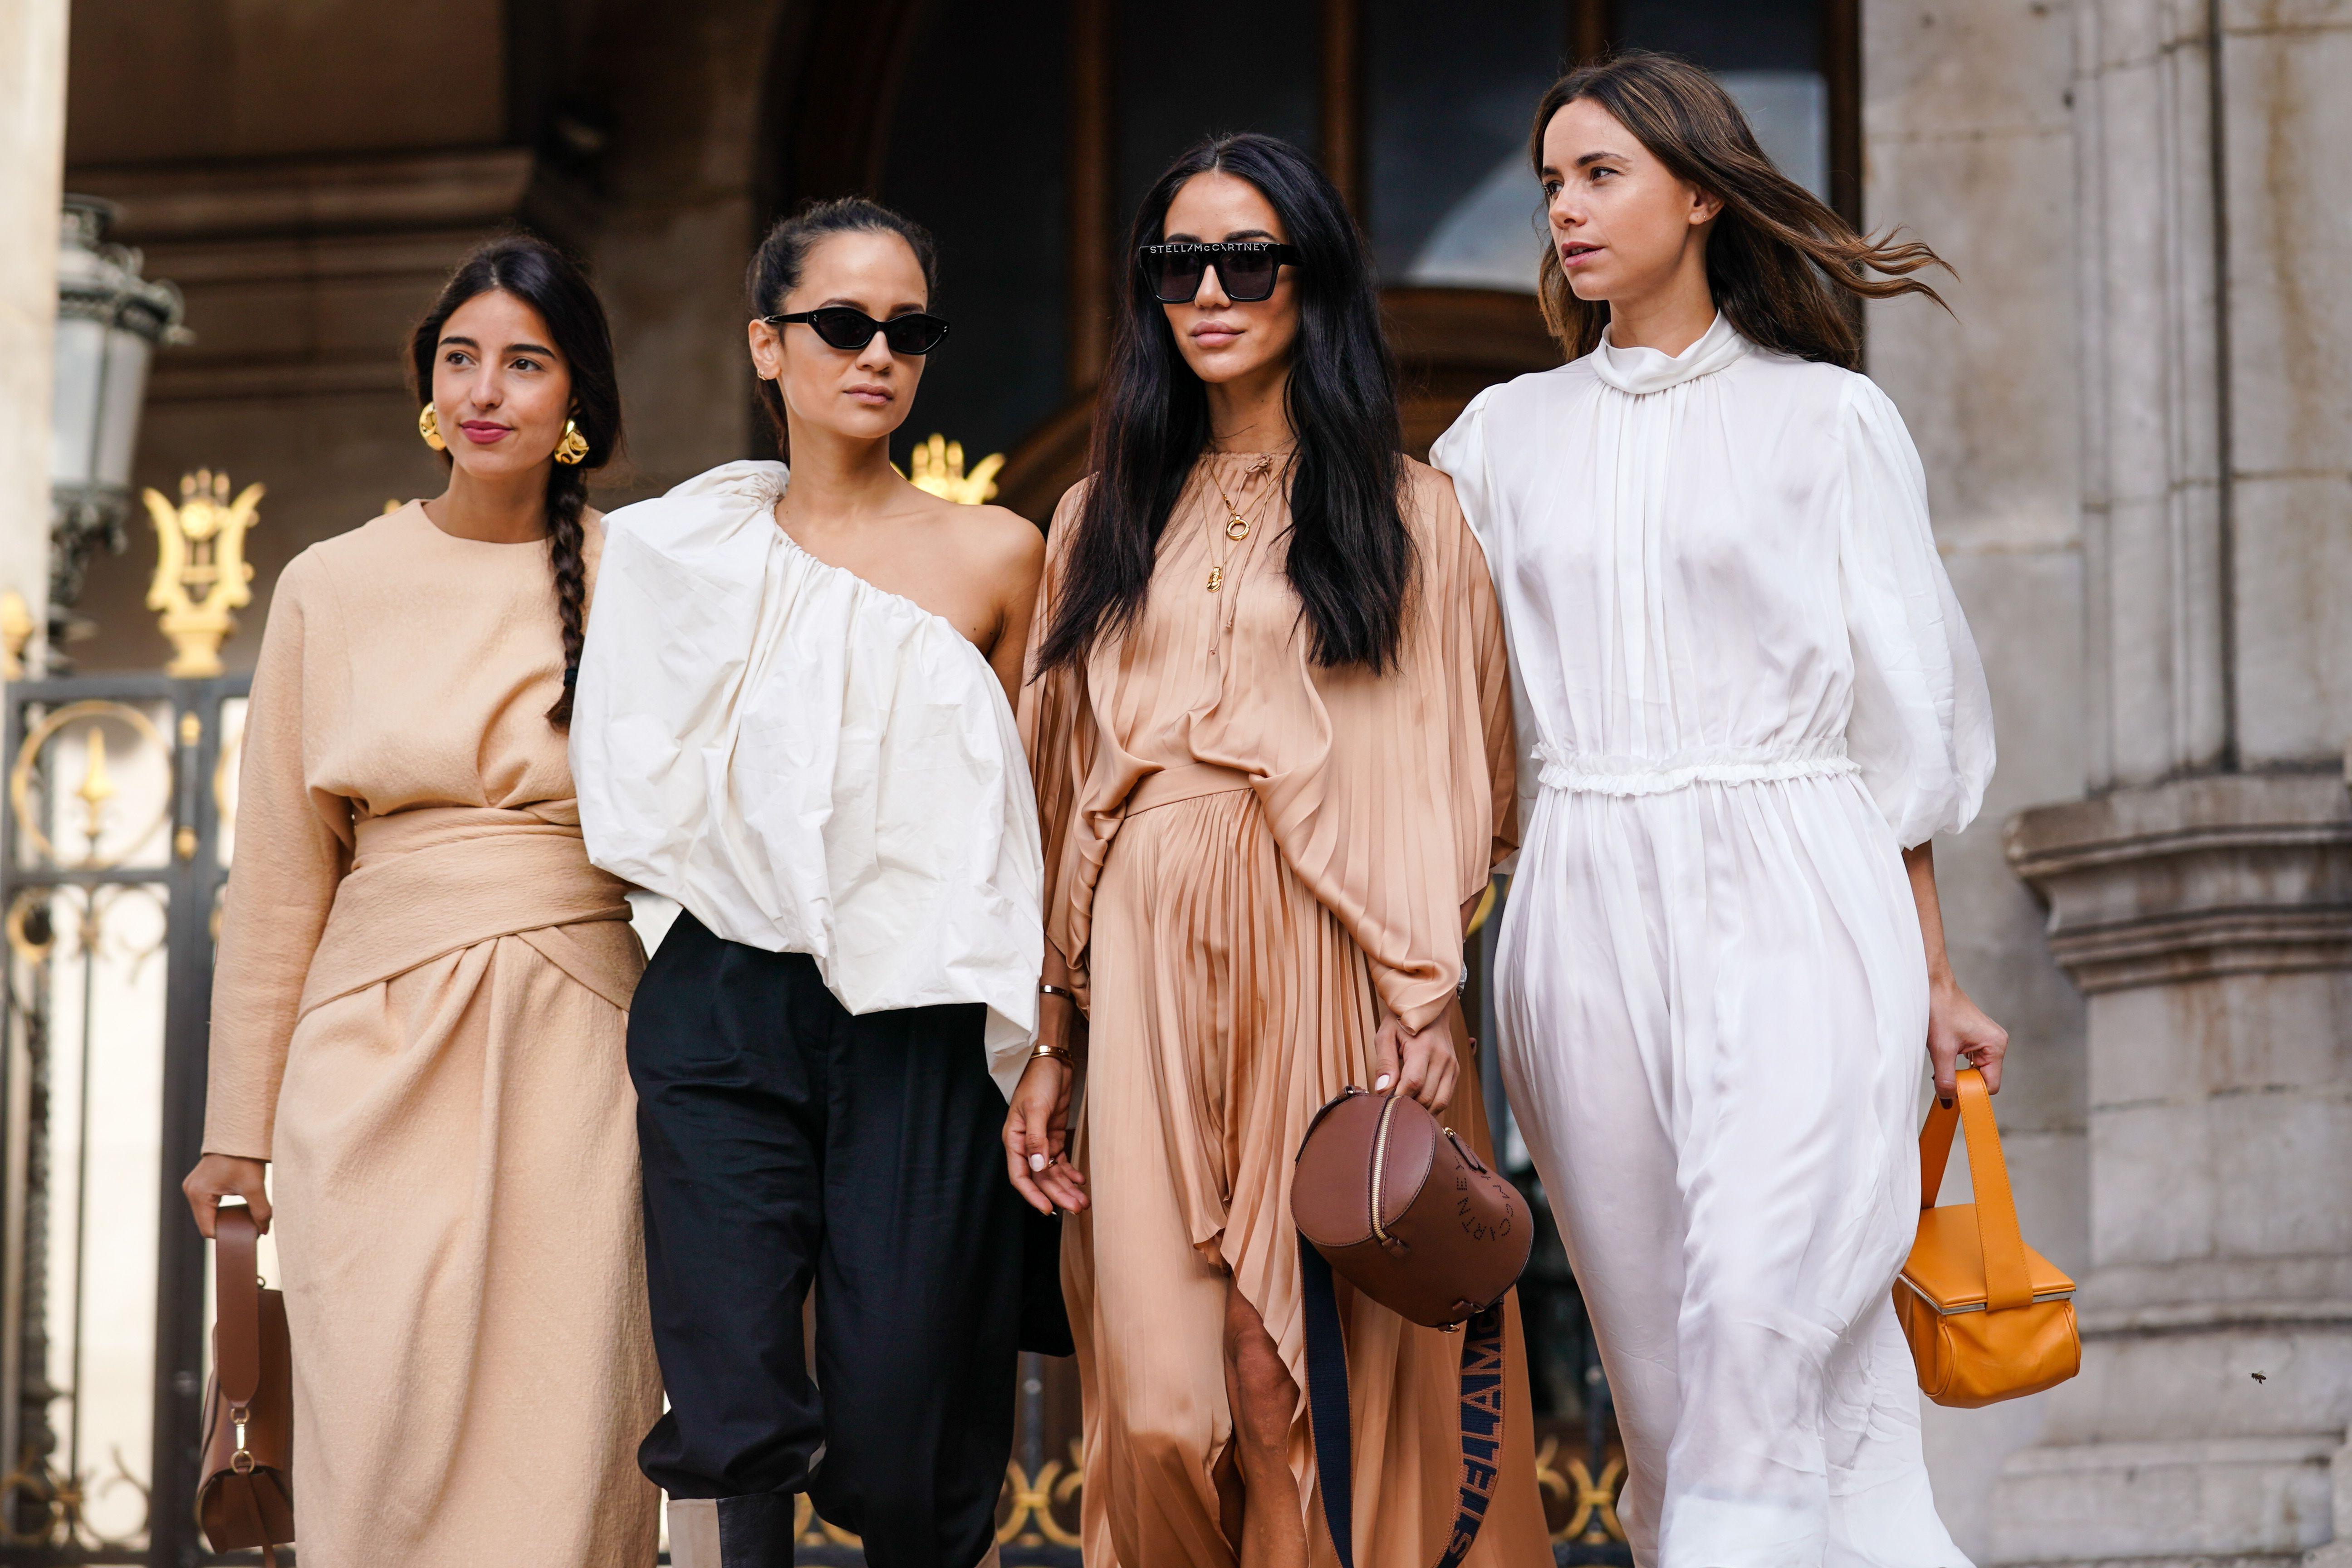 Vestiti moda 2020: 15 vestiti tendenza Primavera 2020 da